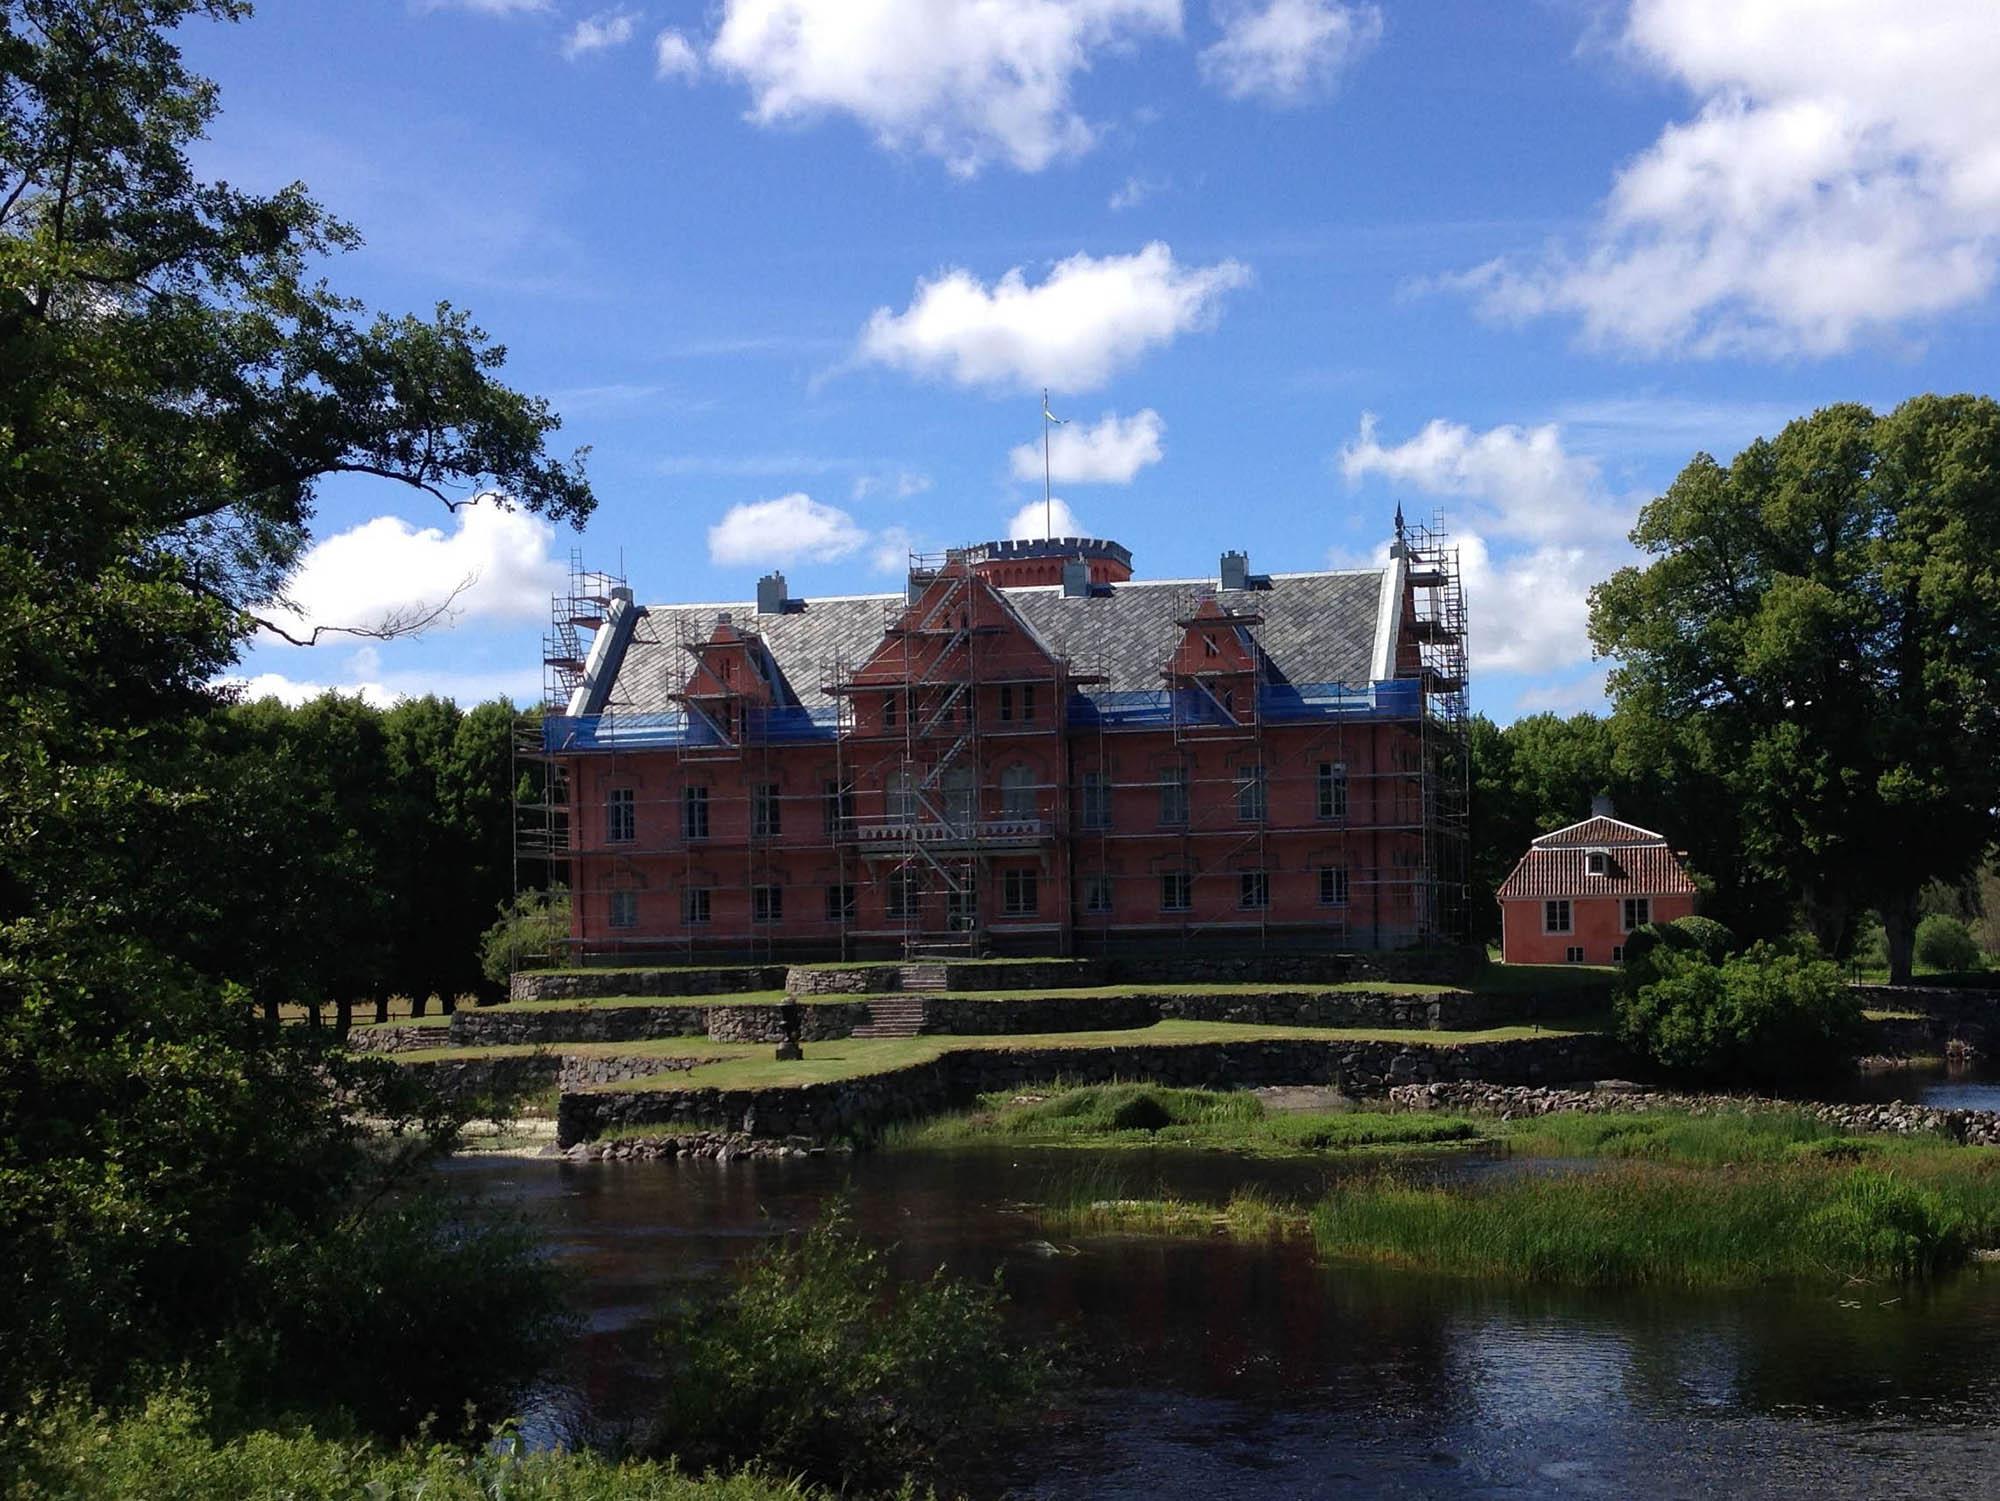 Gåsevadholms slott